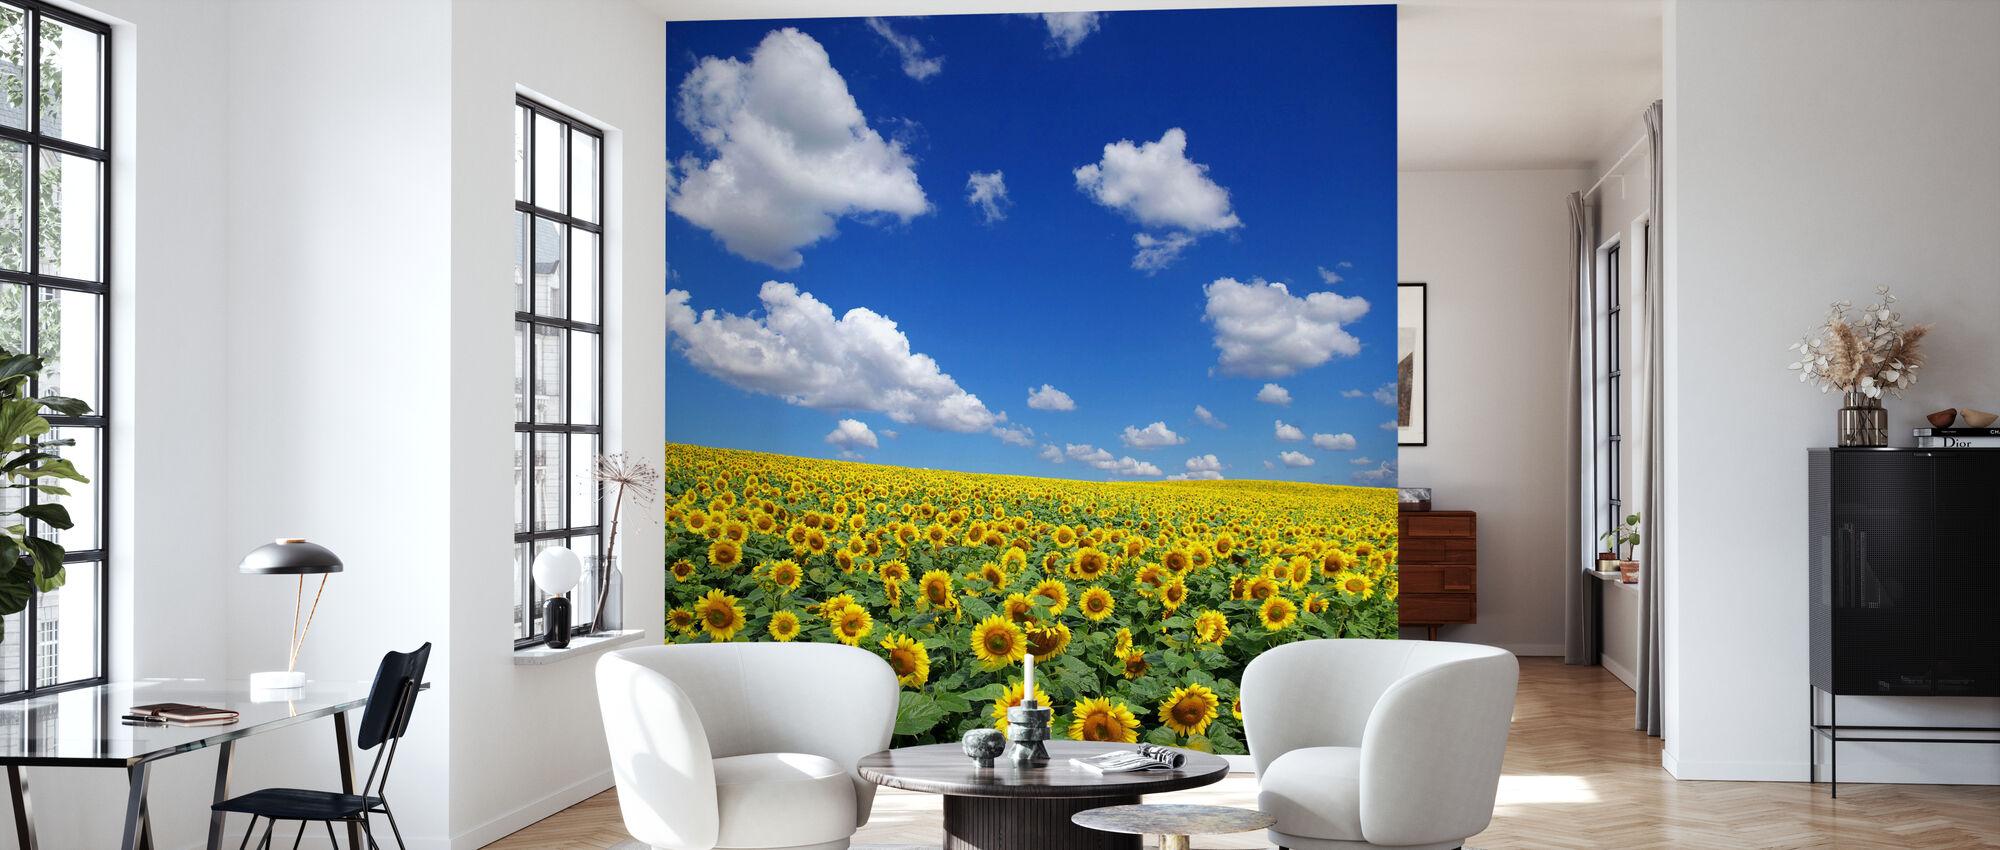 Zonnebloem veld - Behang - Woonkamer